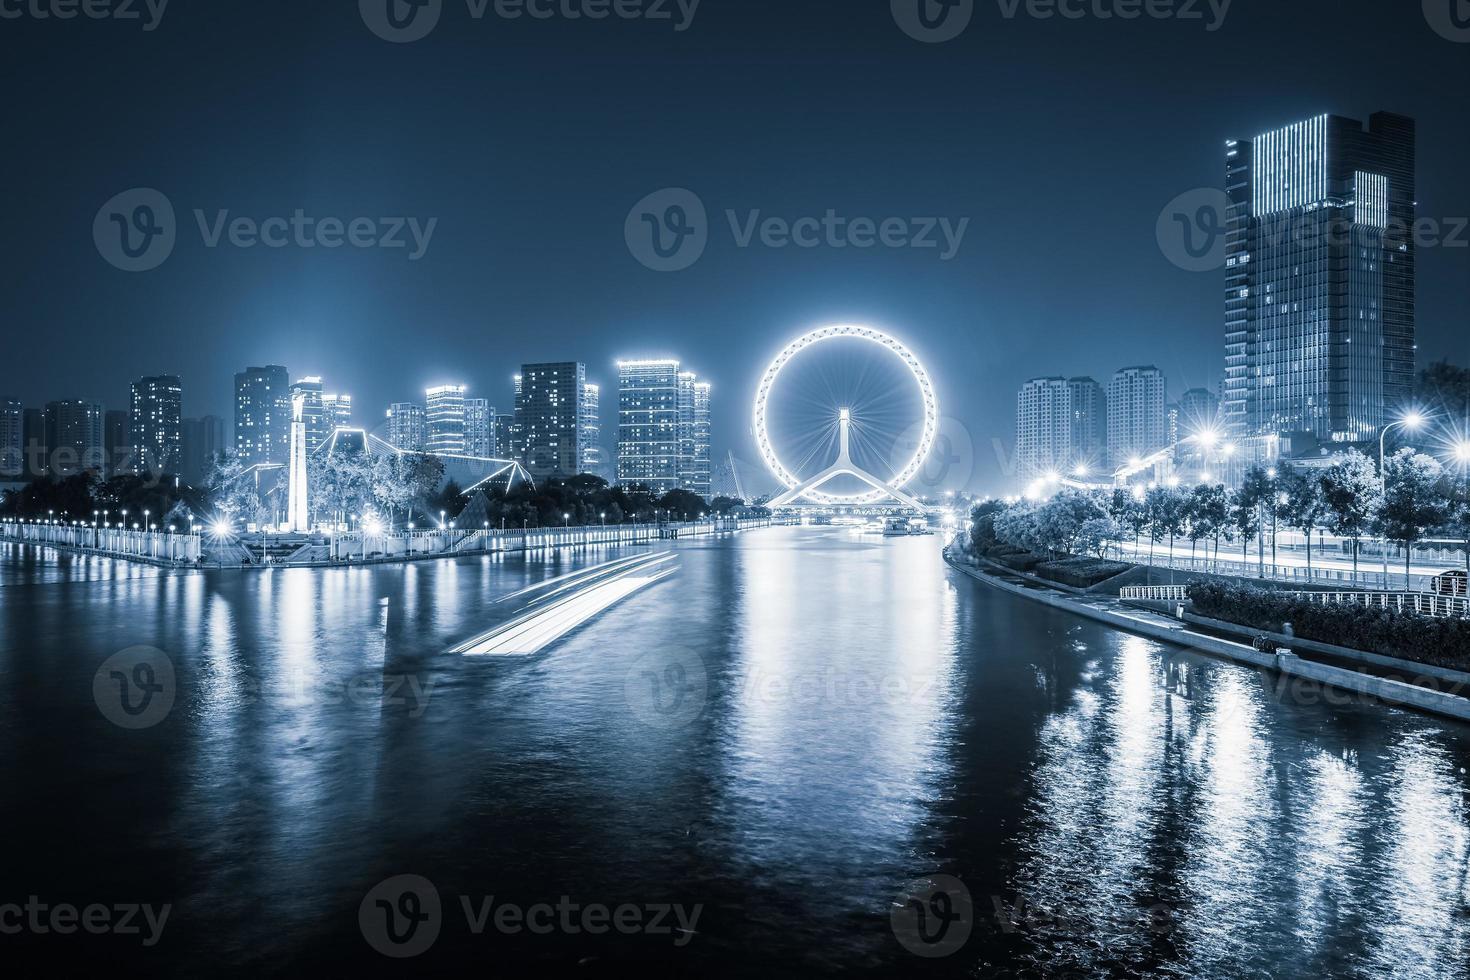 tianjin haihe rivier 's nachts foto